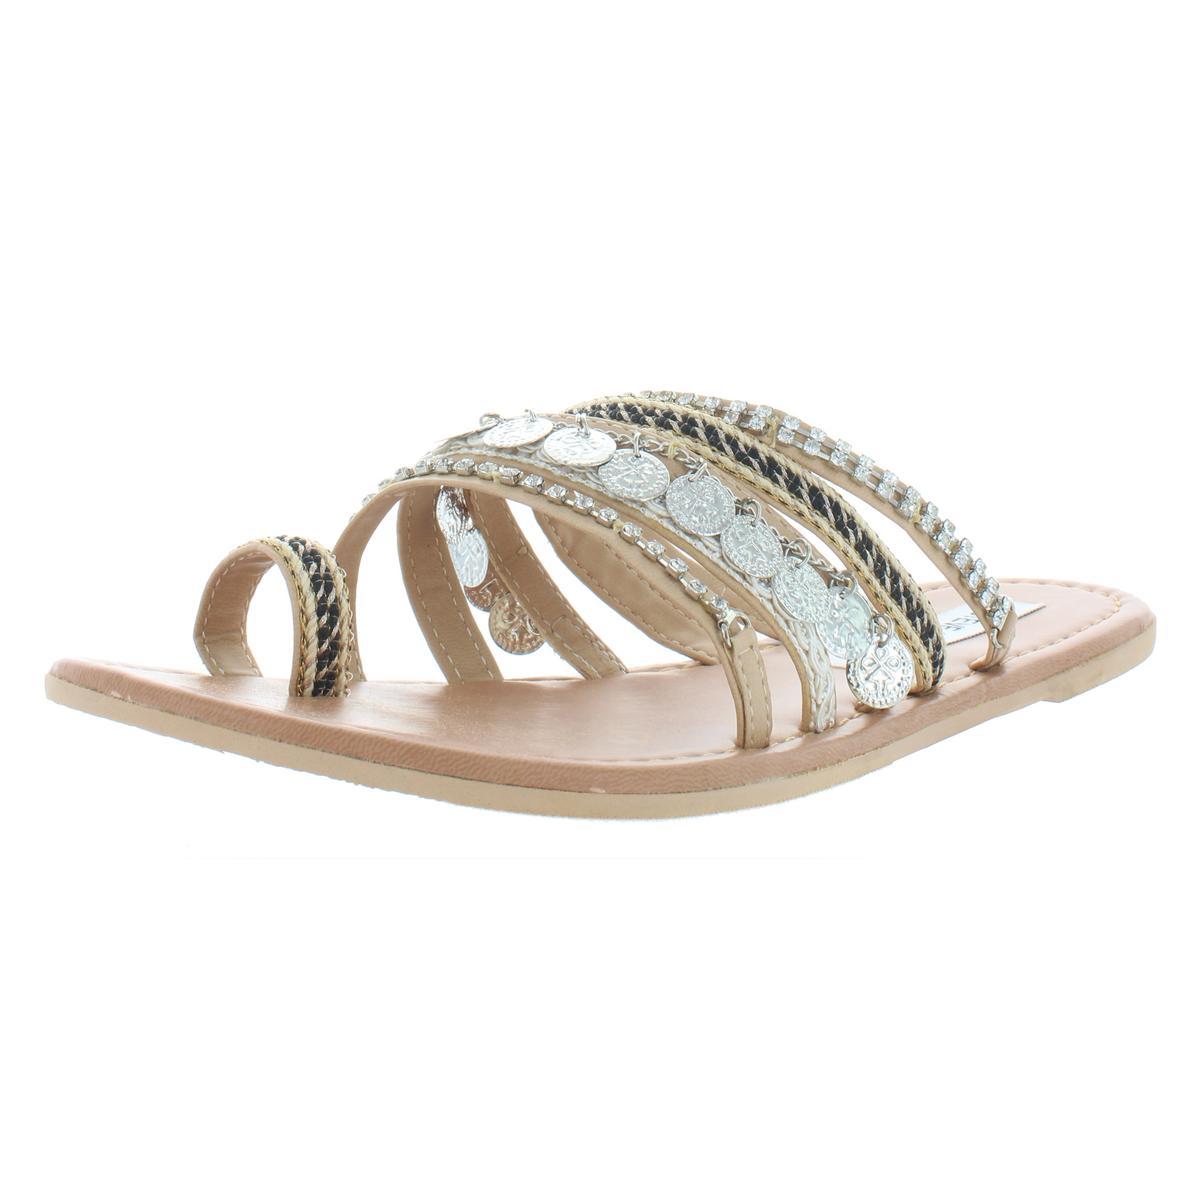 fbc771573 Steve Madden Womens Carmela Toe Loop Slide Embellished Flats Sandals ...